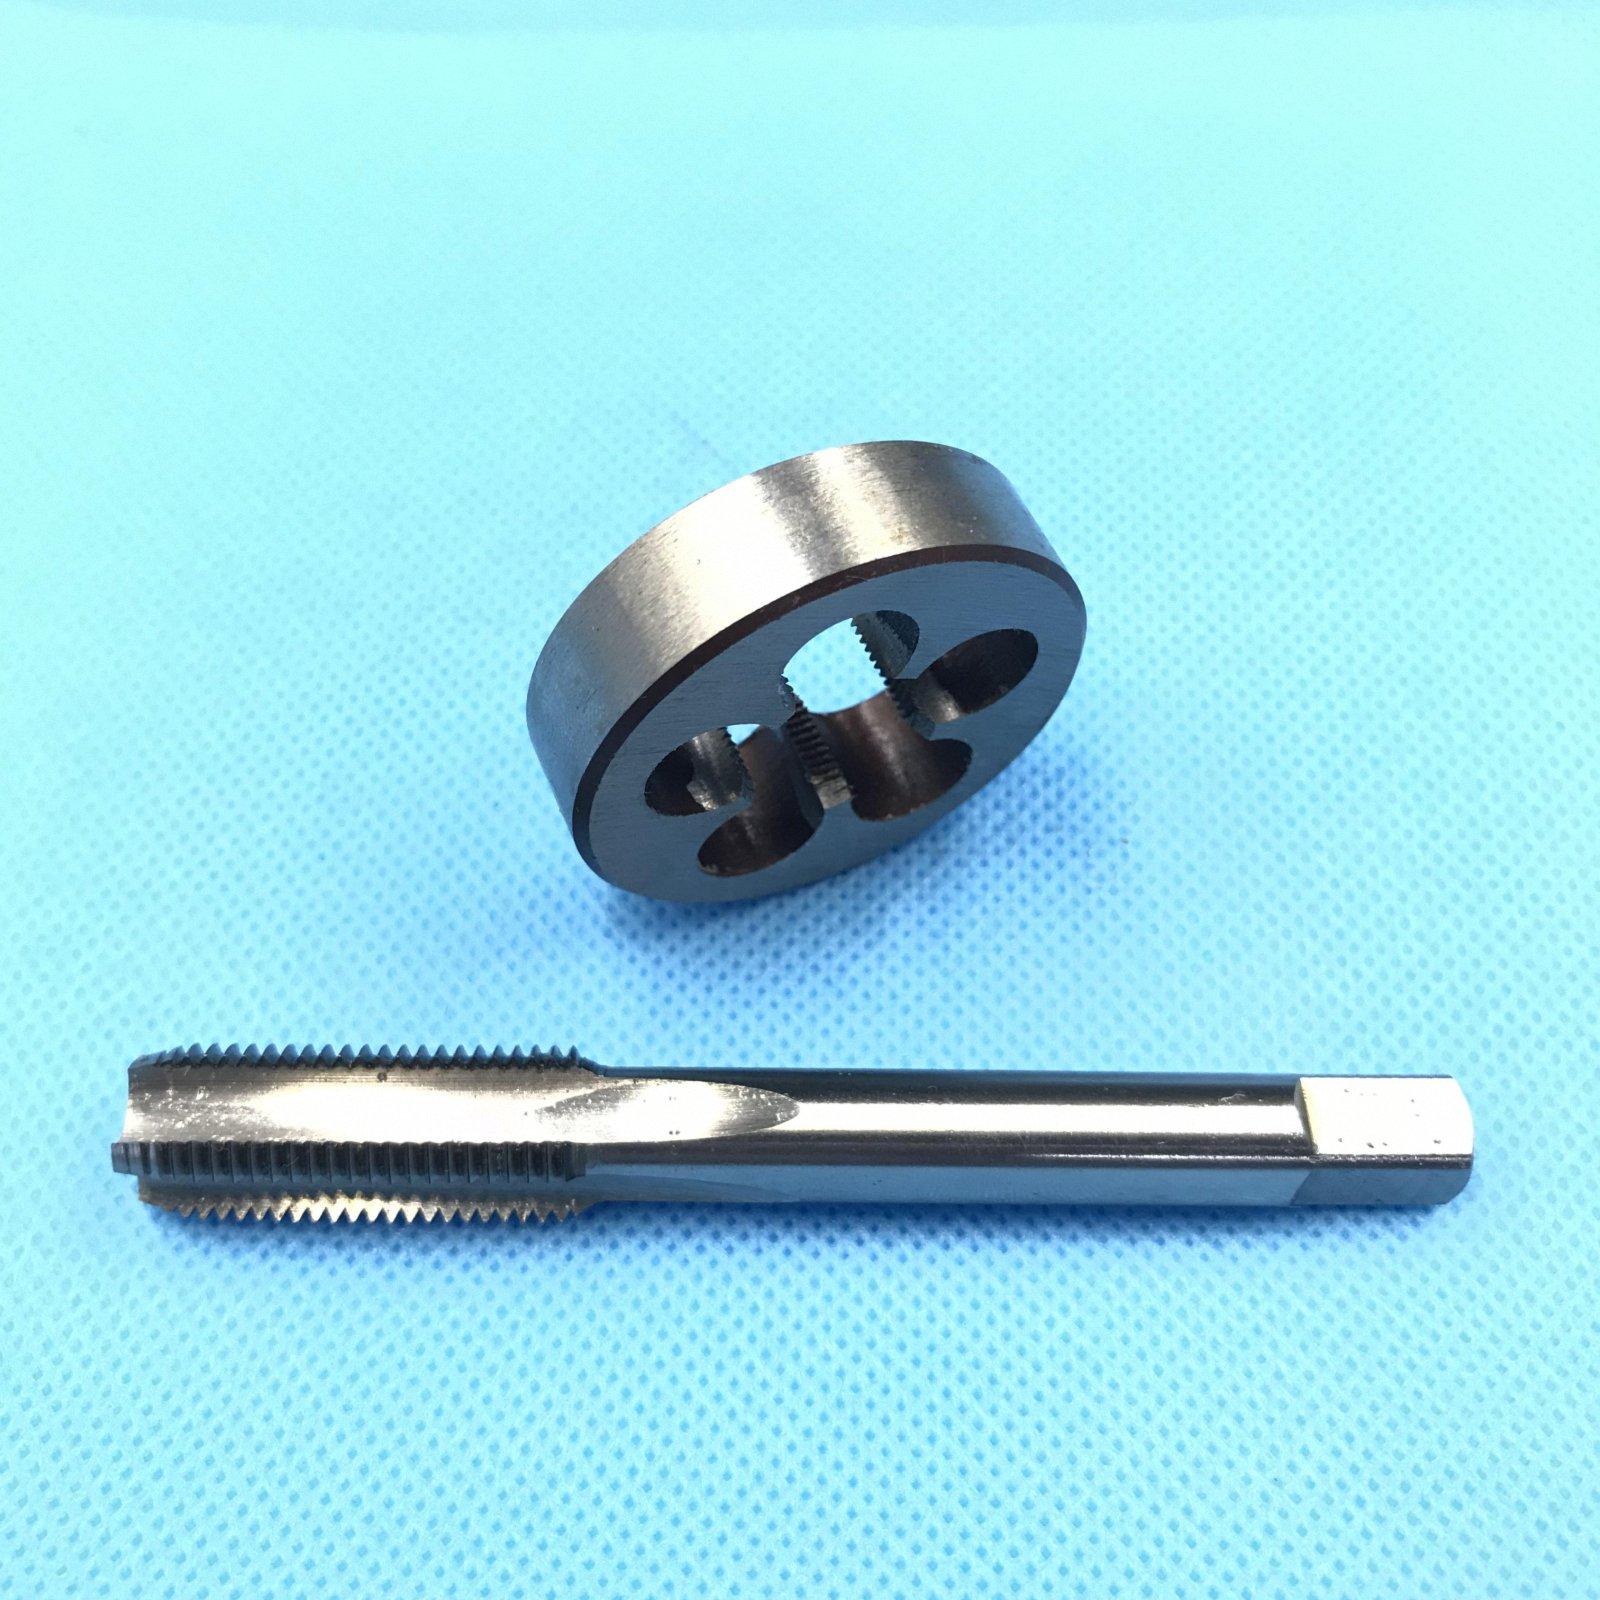 M17 x 2.0 HSS Metric Left Hand Thread Tap